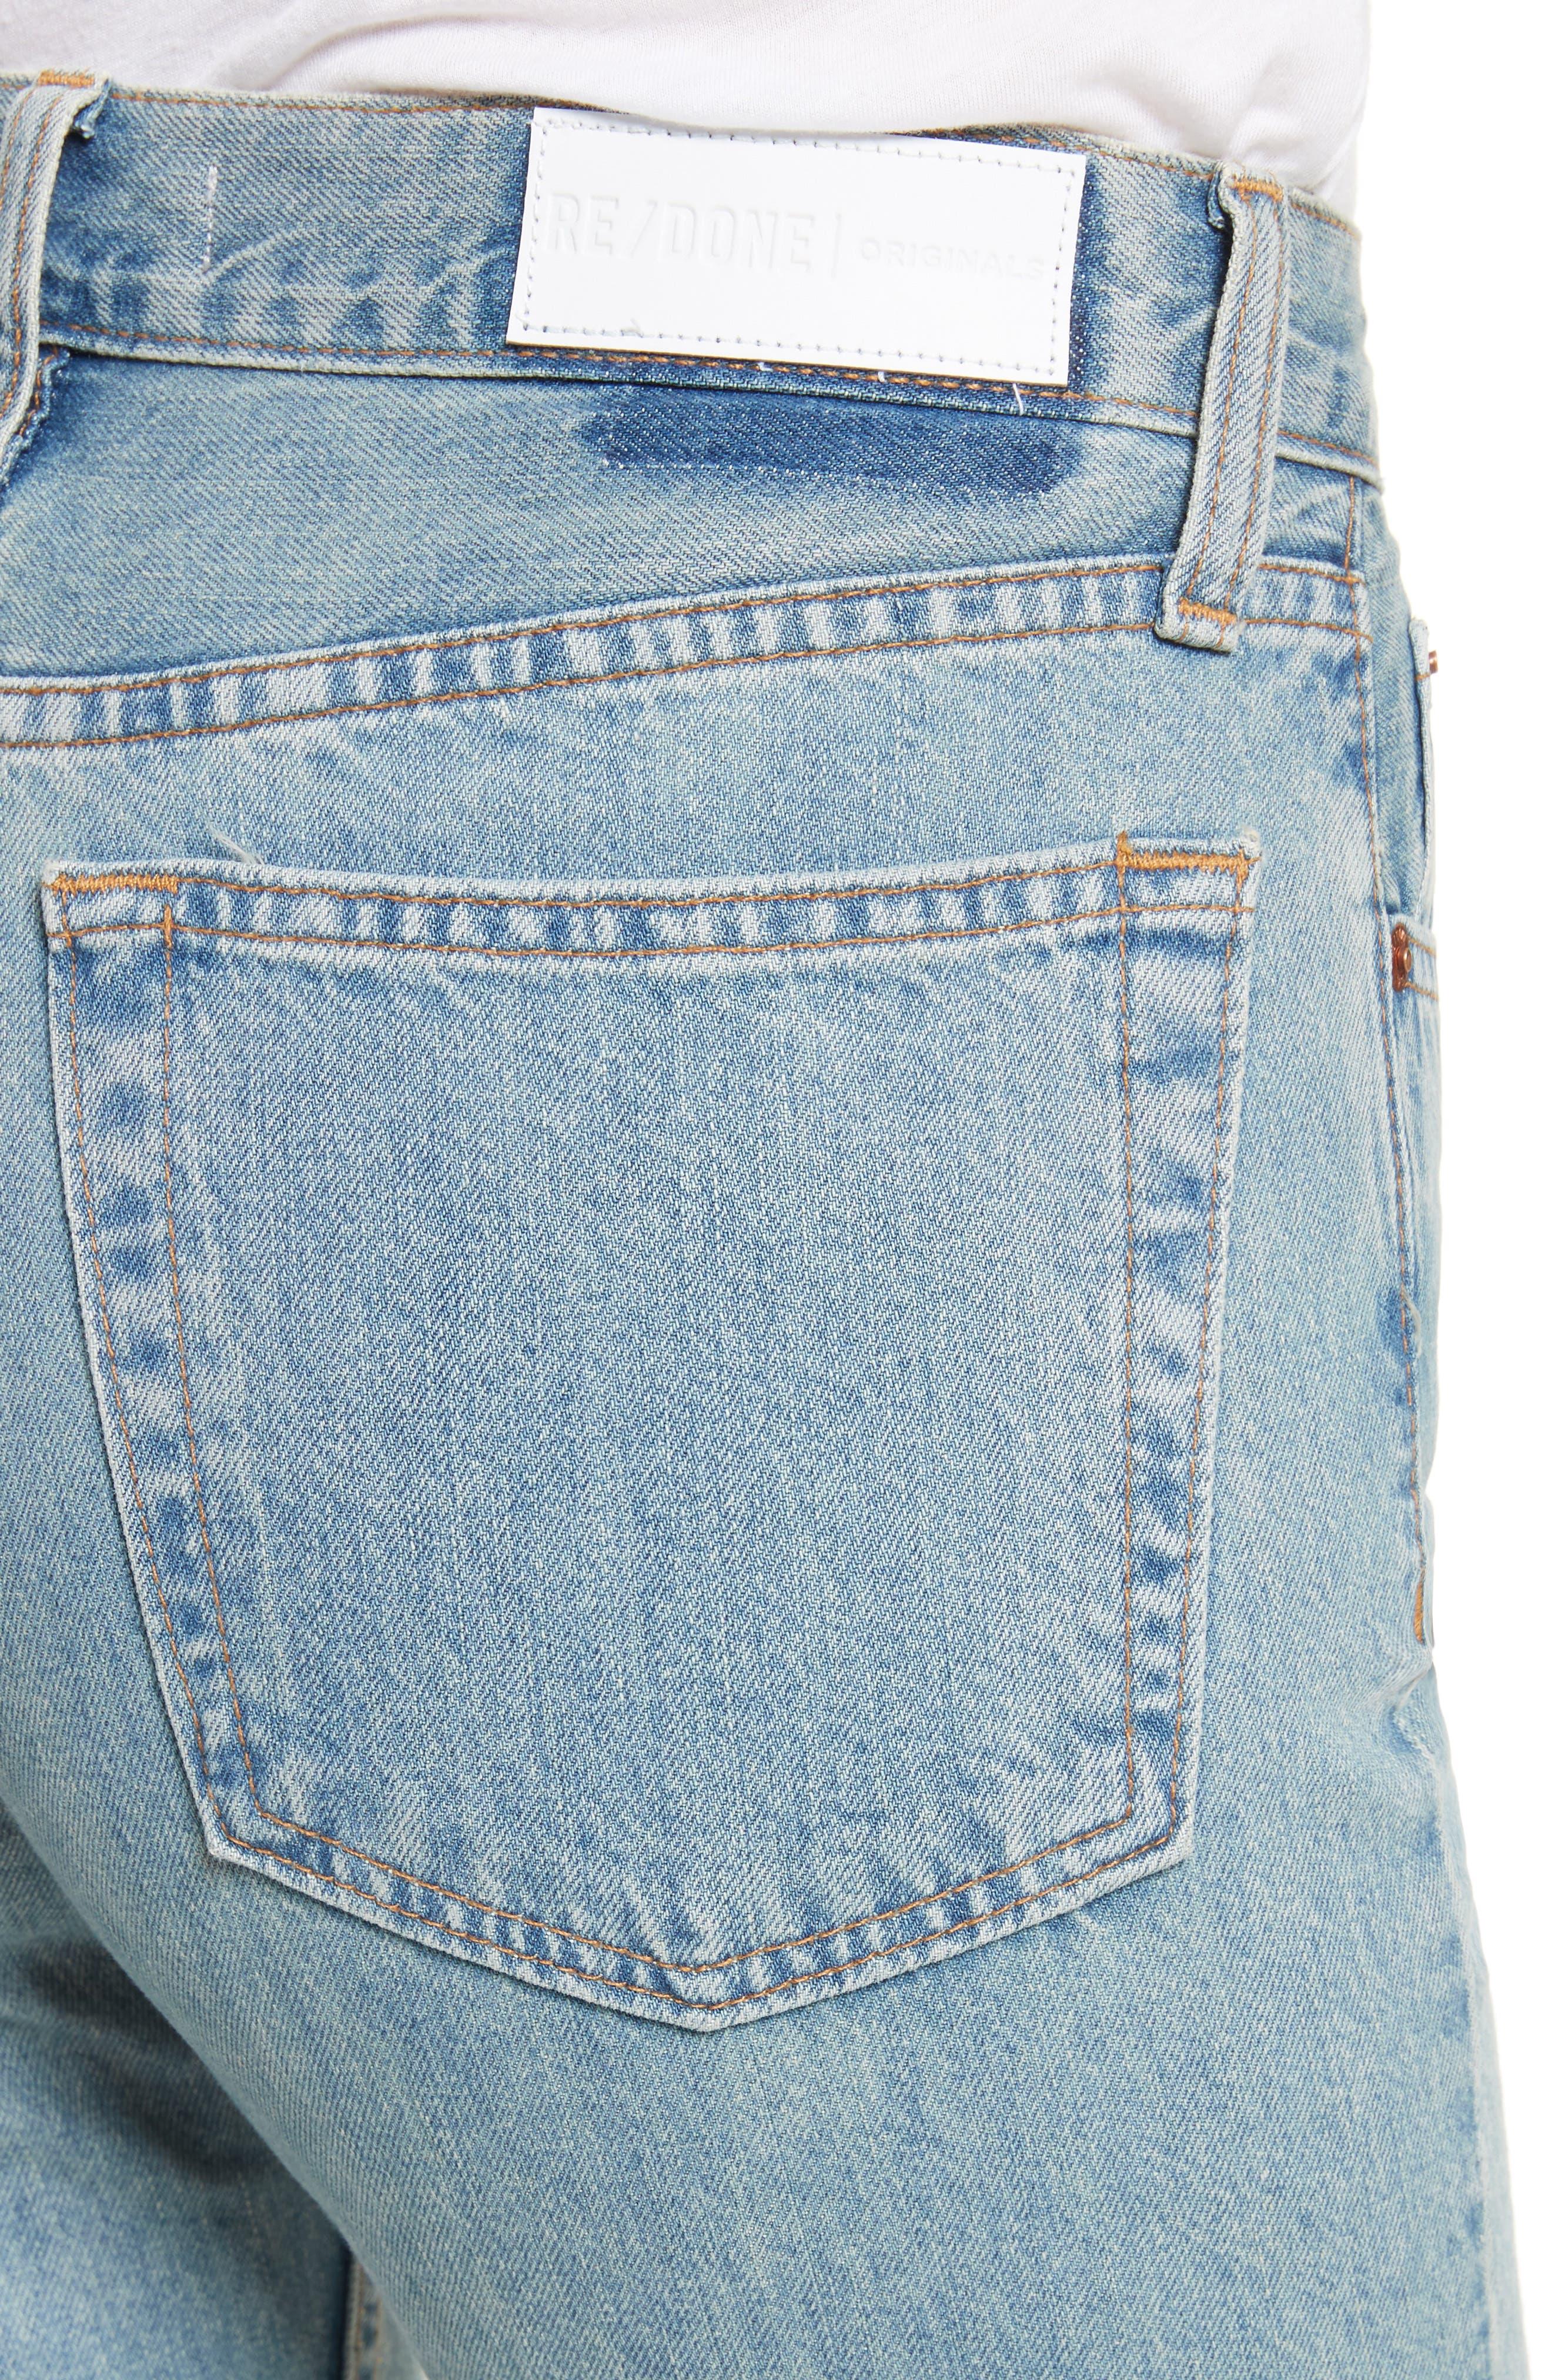 Alternate Image 4  - Re/Done Originals High Waist Ankle Zip Jeans